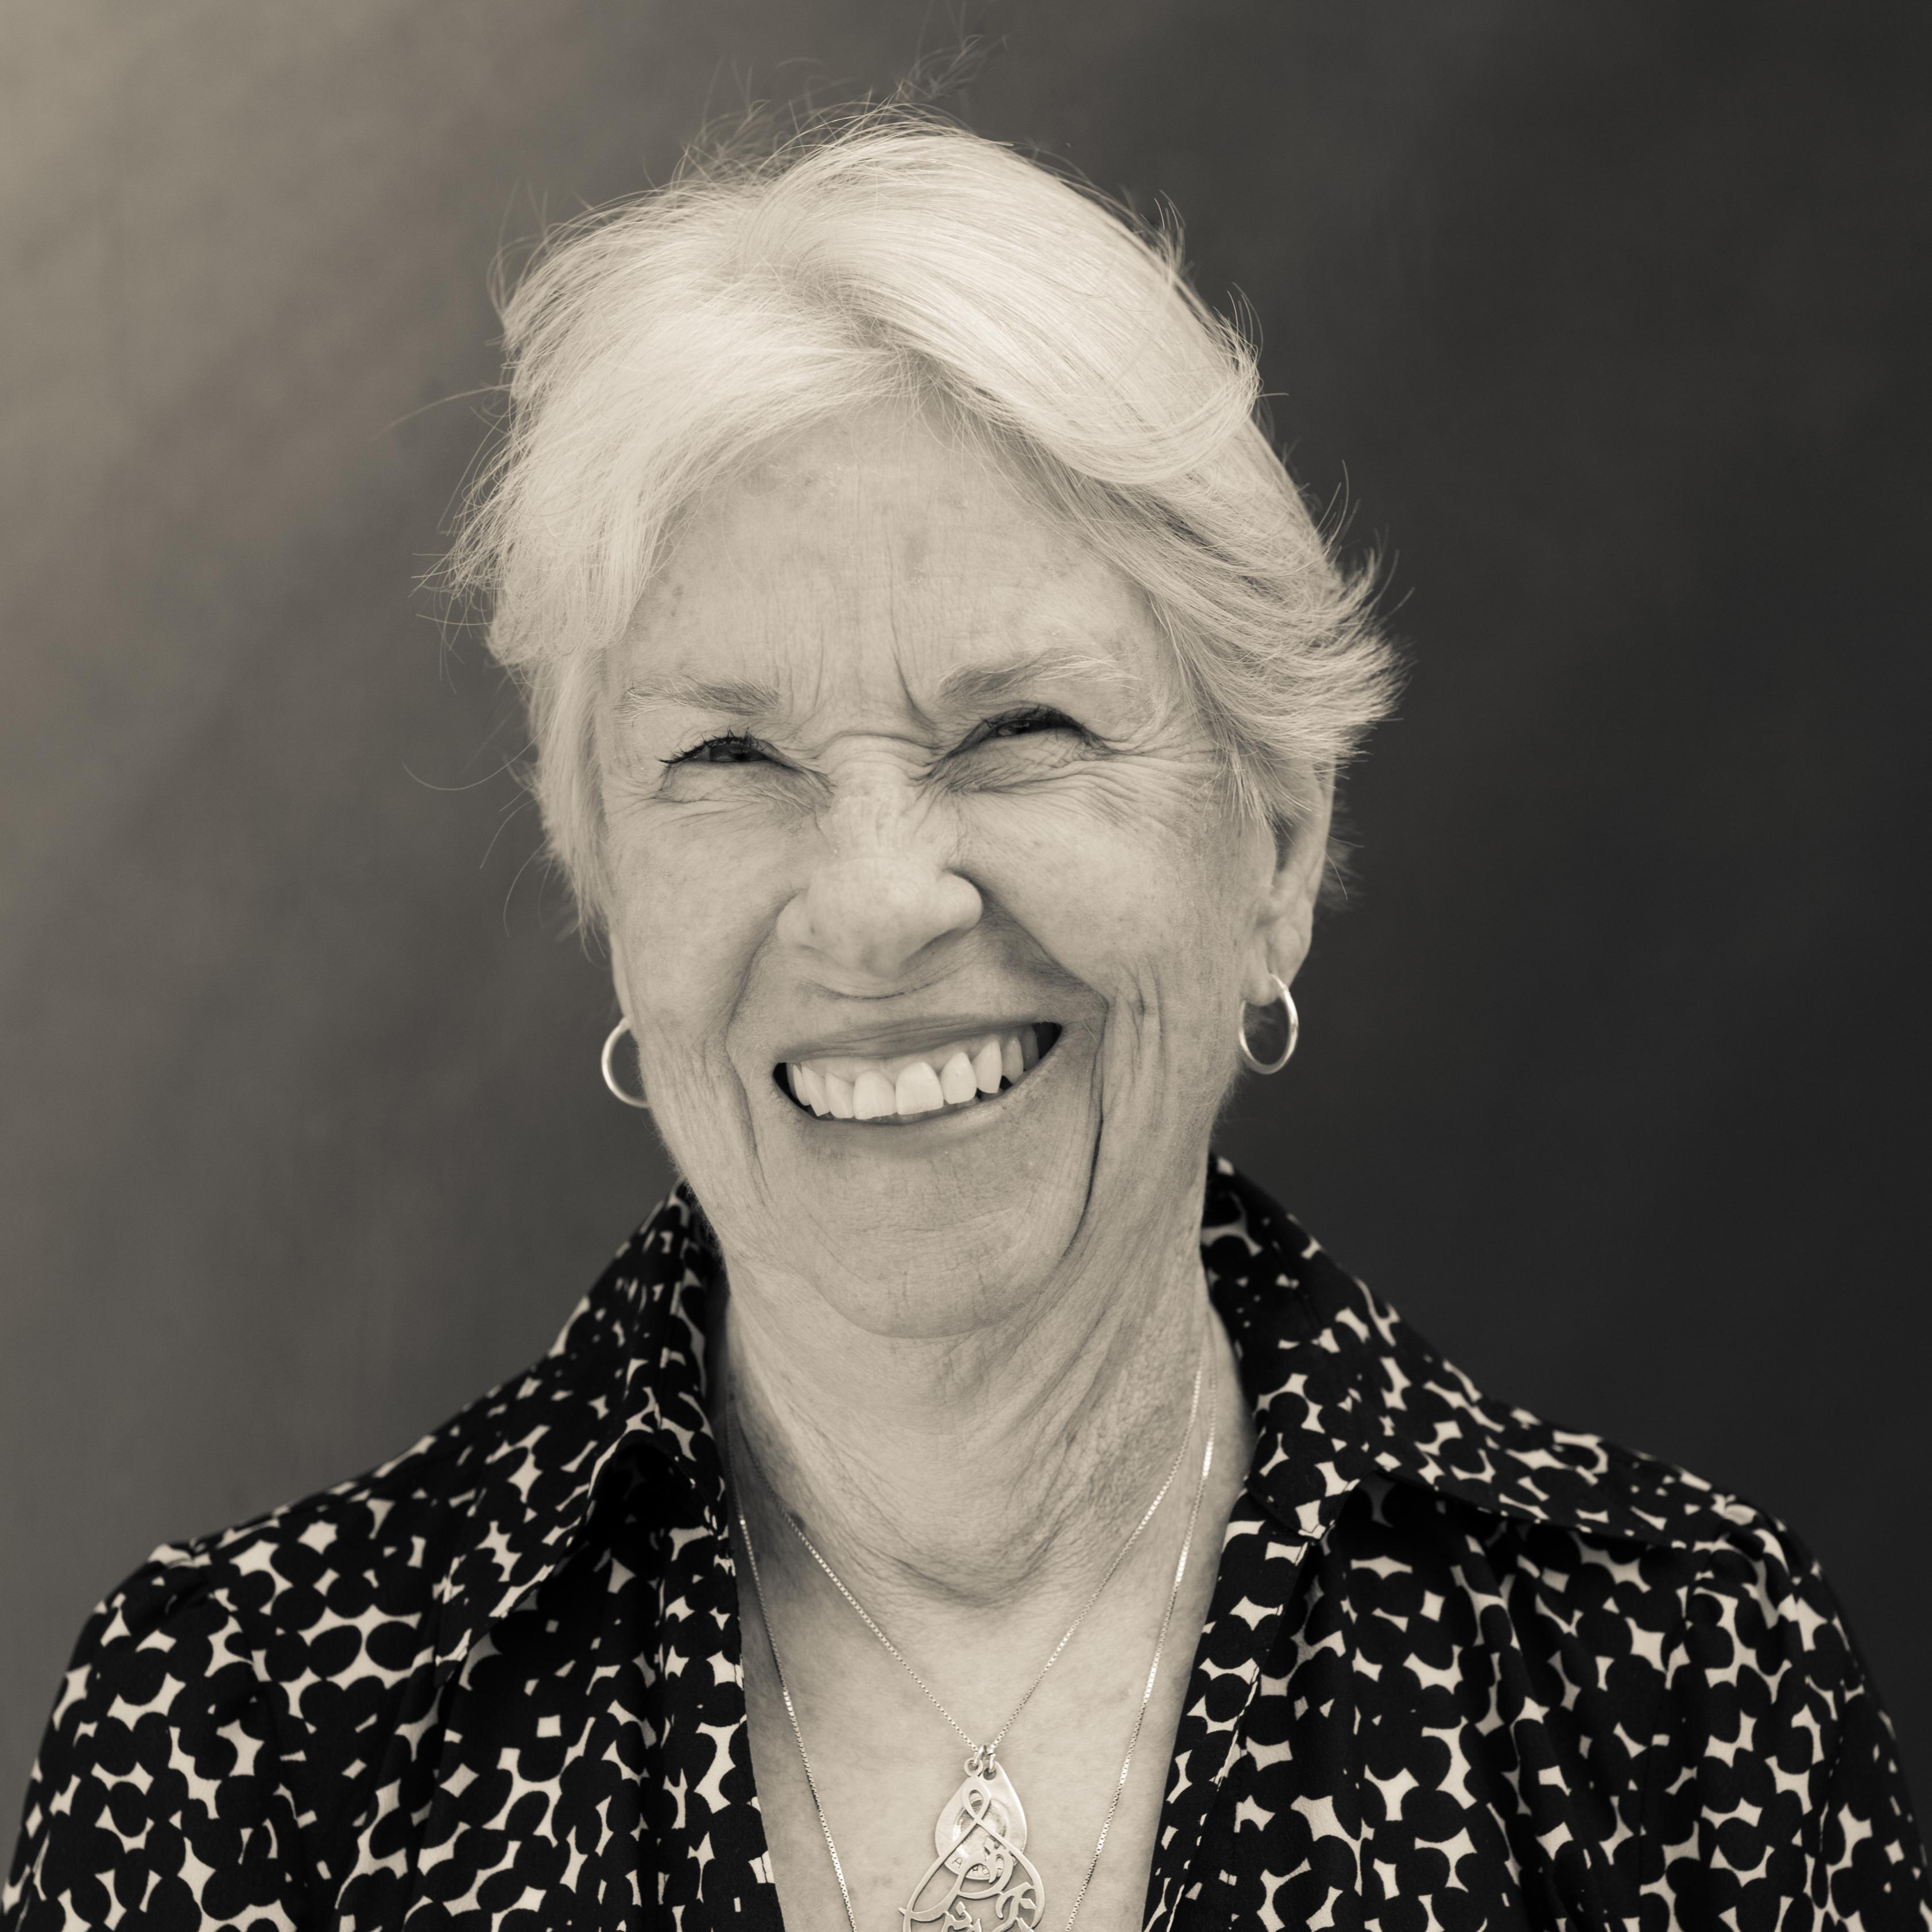 Marianna Hof